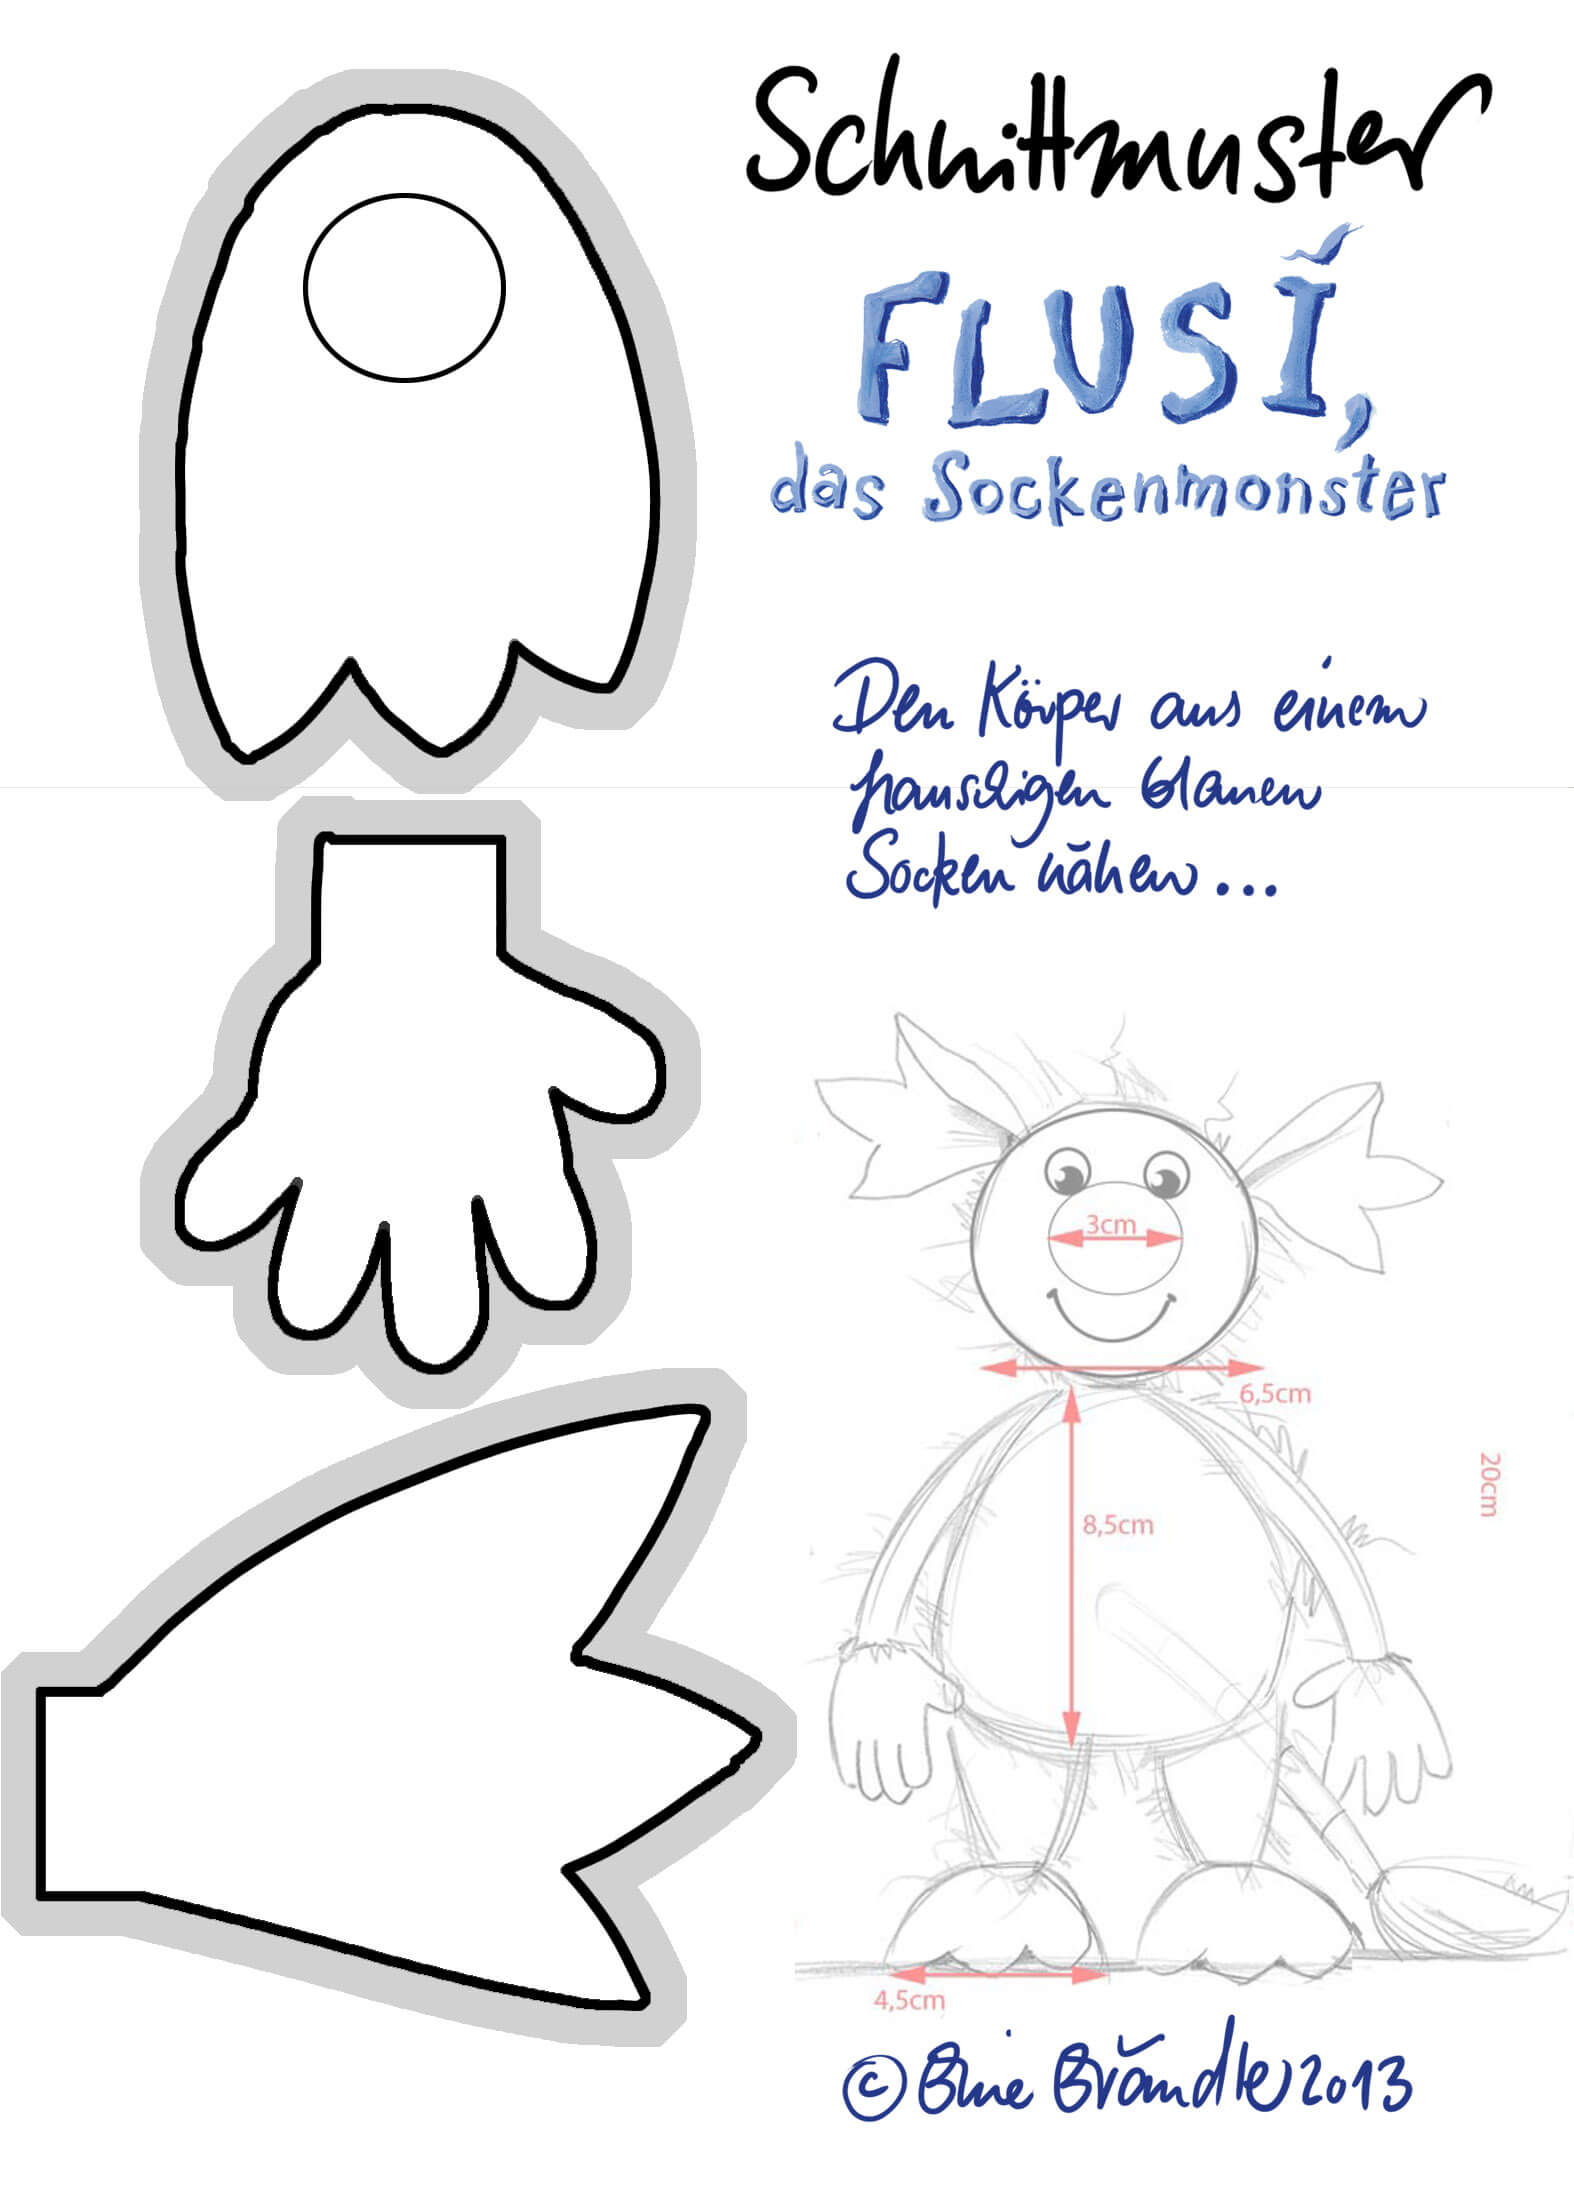 Schnittmuster Flusi Hand Fuß Ohr - Schnittmuster